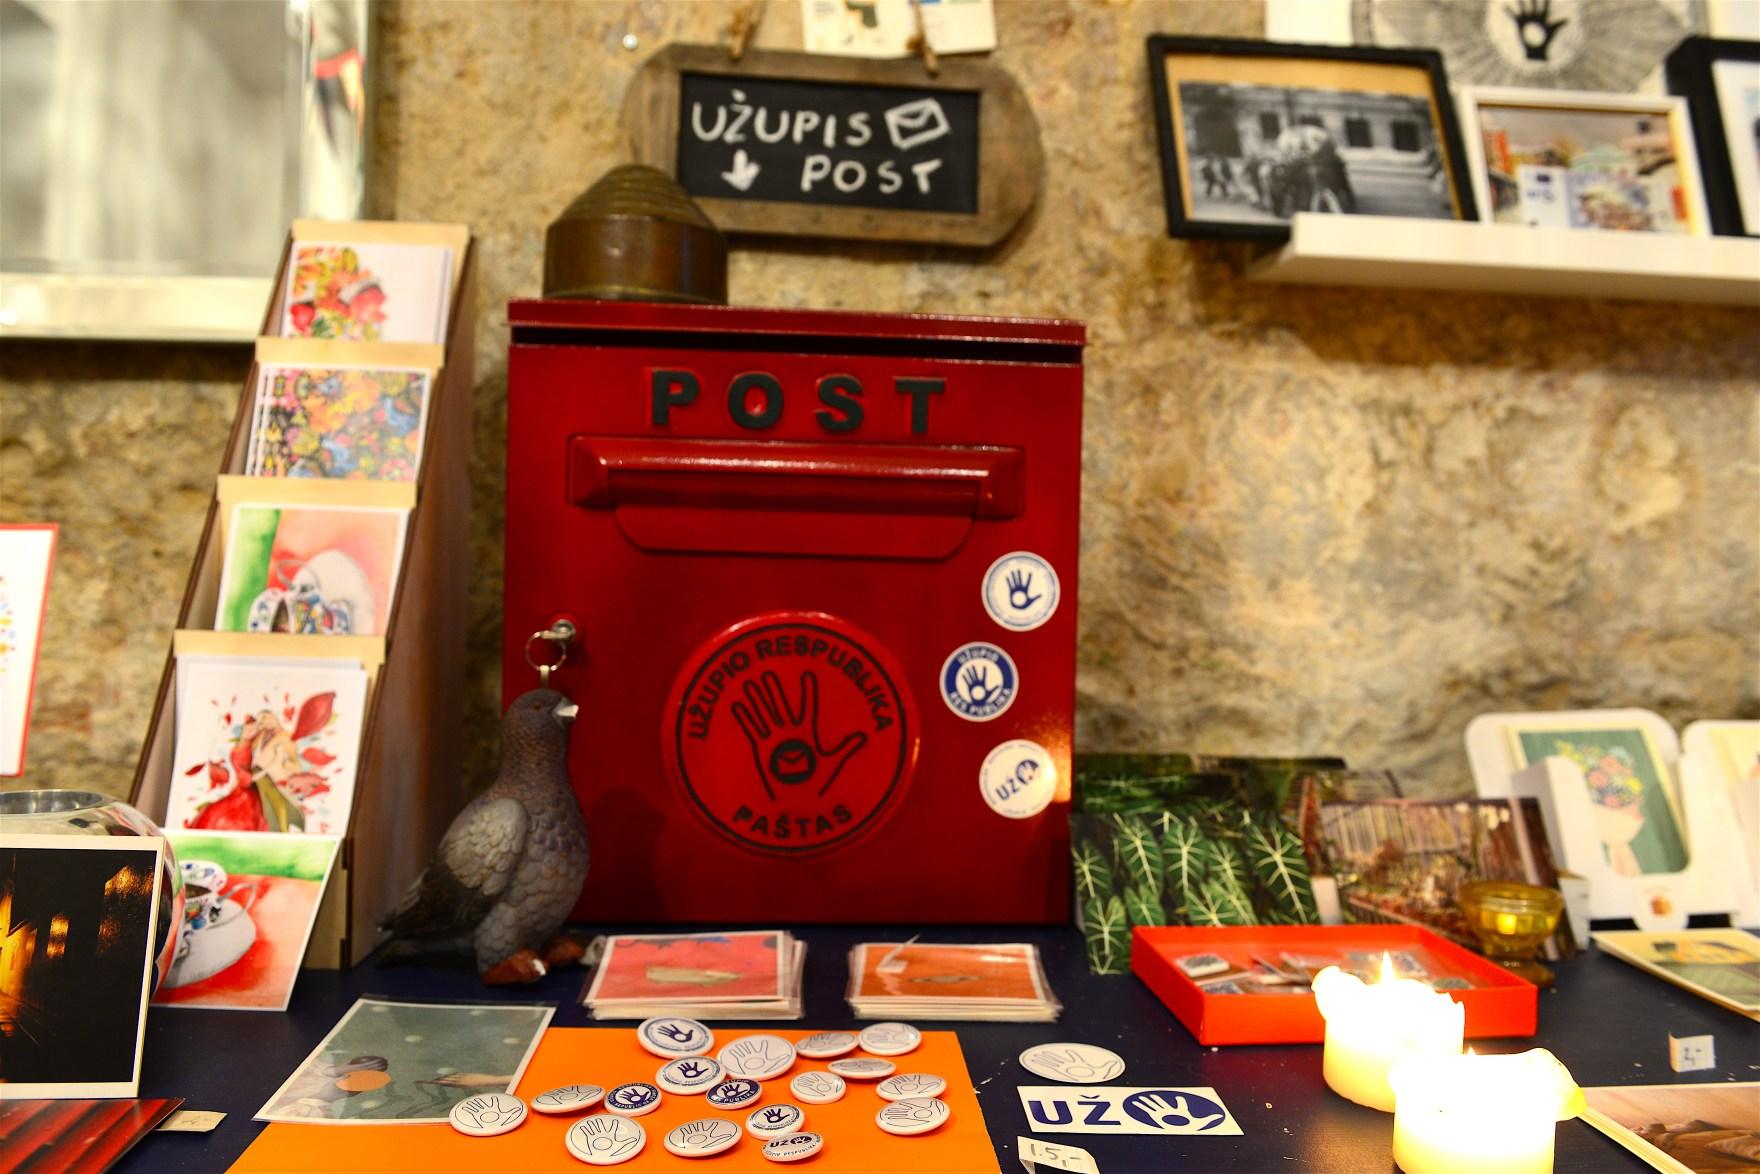 Send postcards from Uzupis post